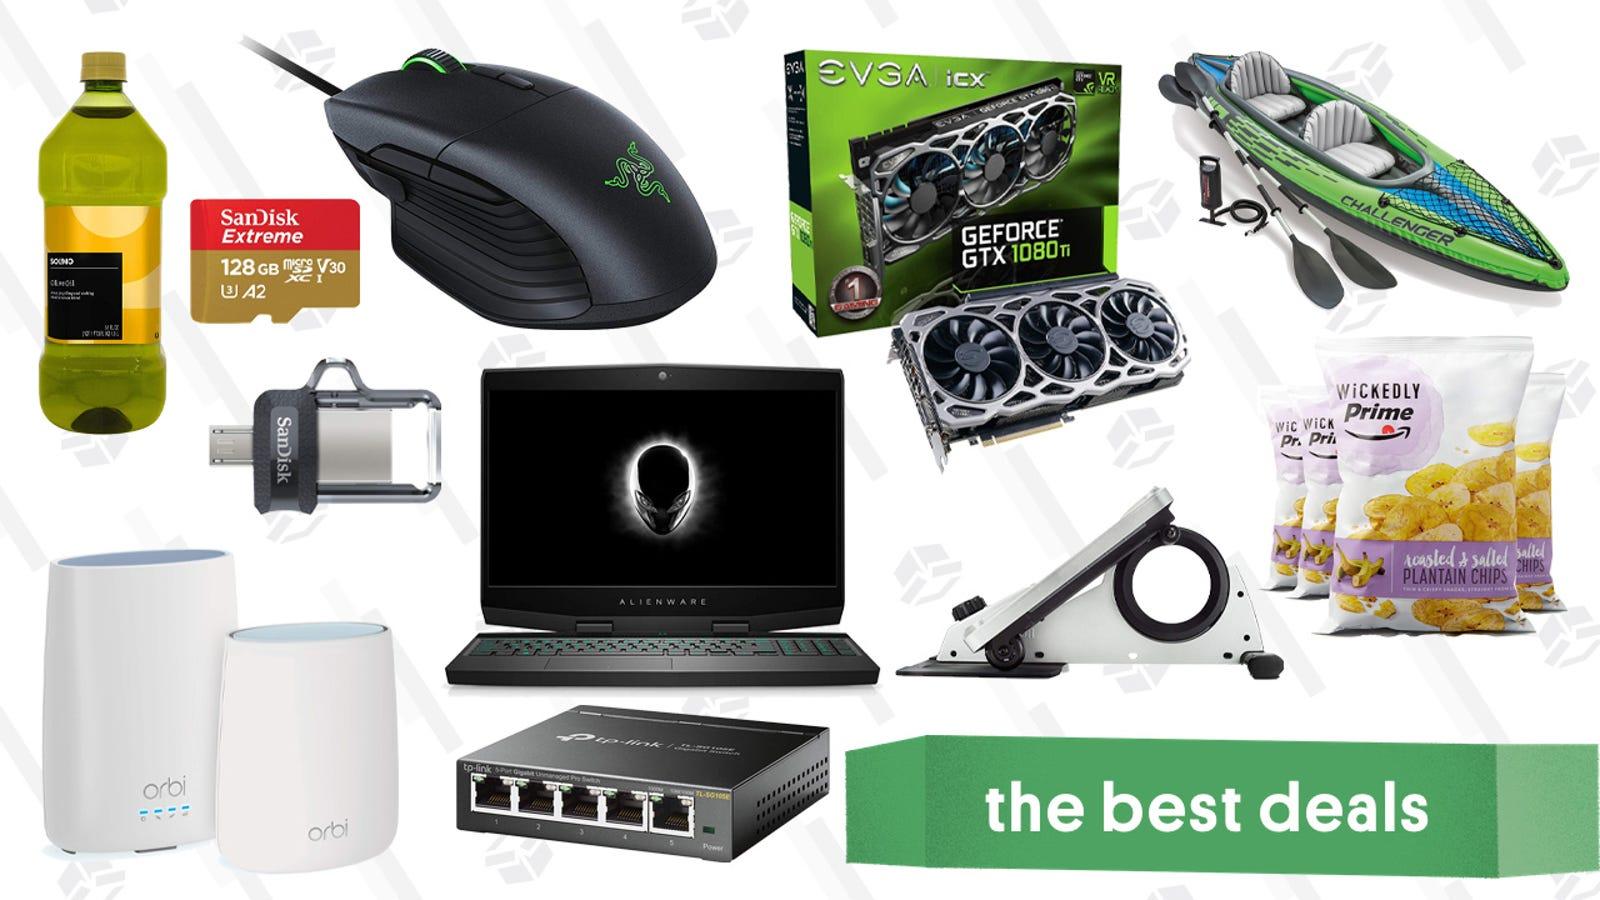 QnA VBage Monday's Best Deals: Laptop Gold Box, Smart Locks, Under-the-Desk Elliptical, and More